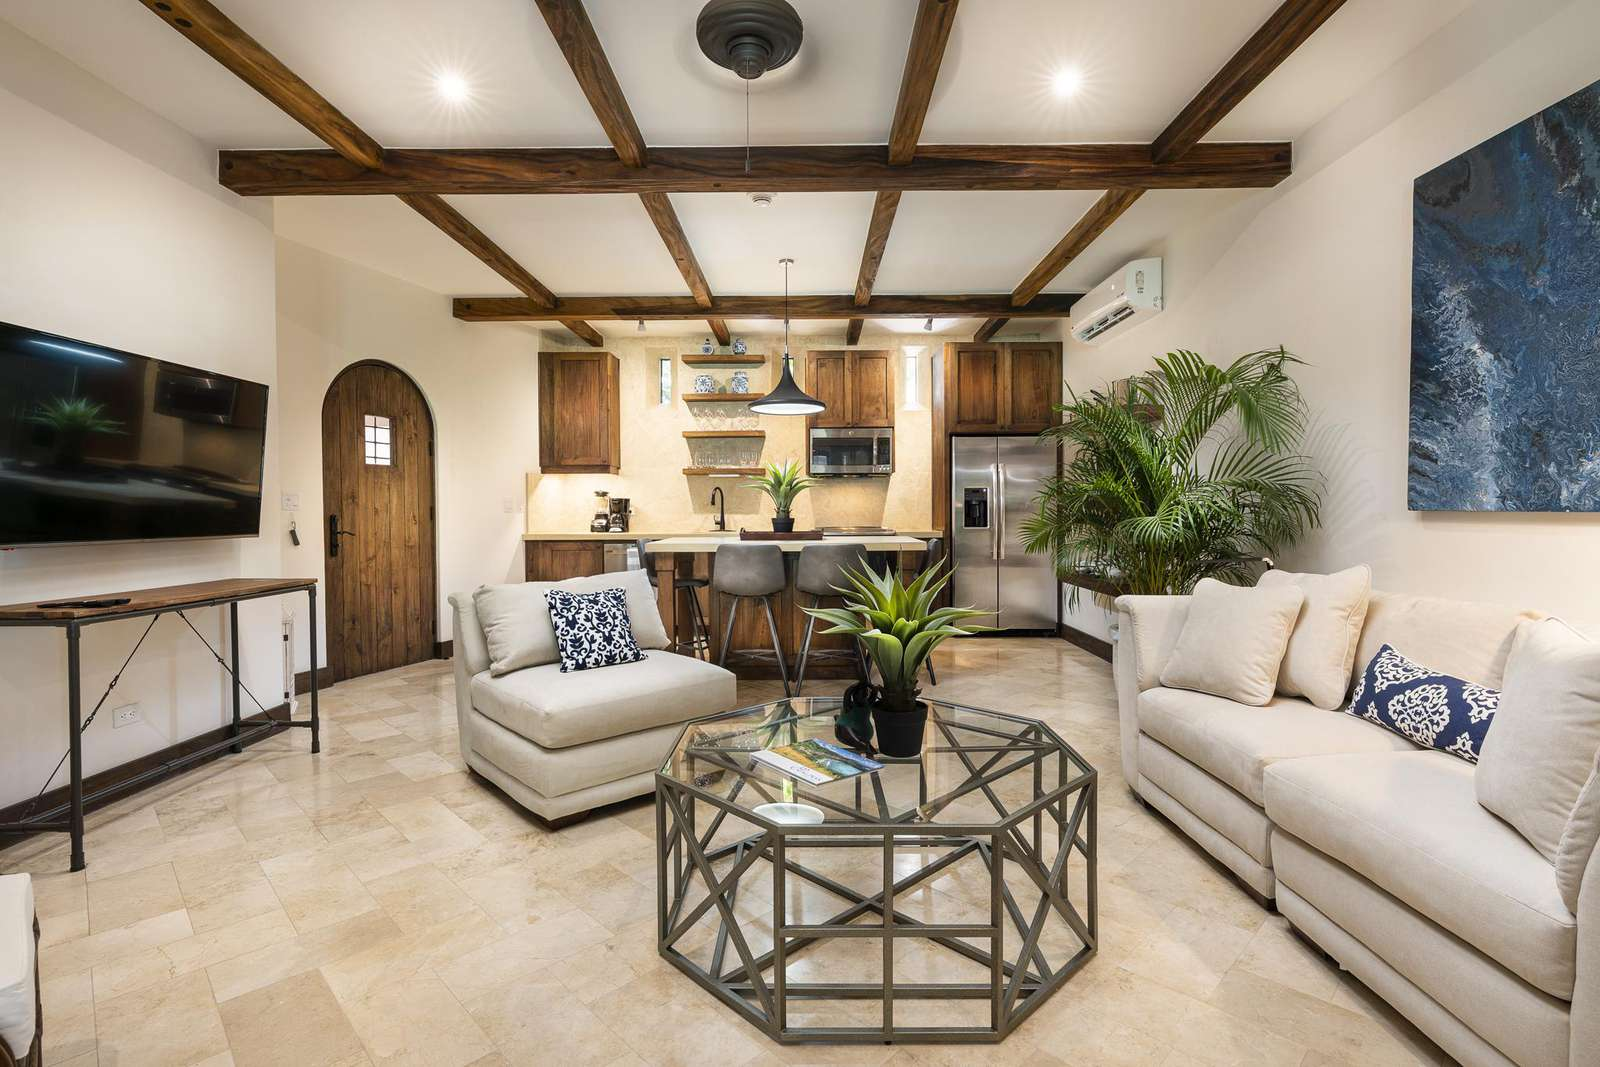 Spacious living area, flat screen TV